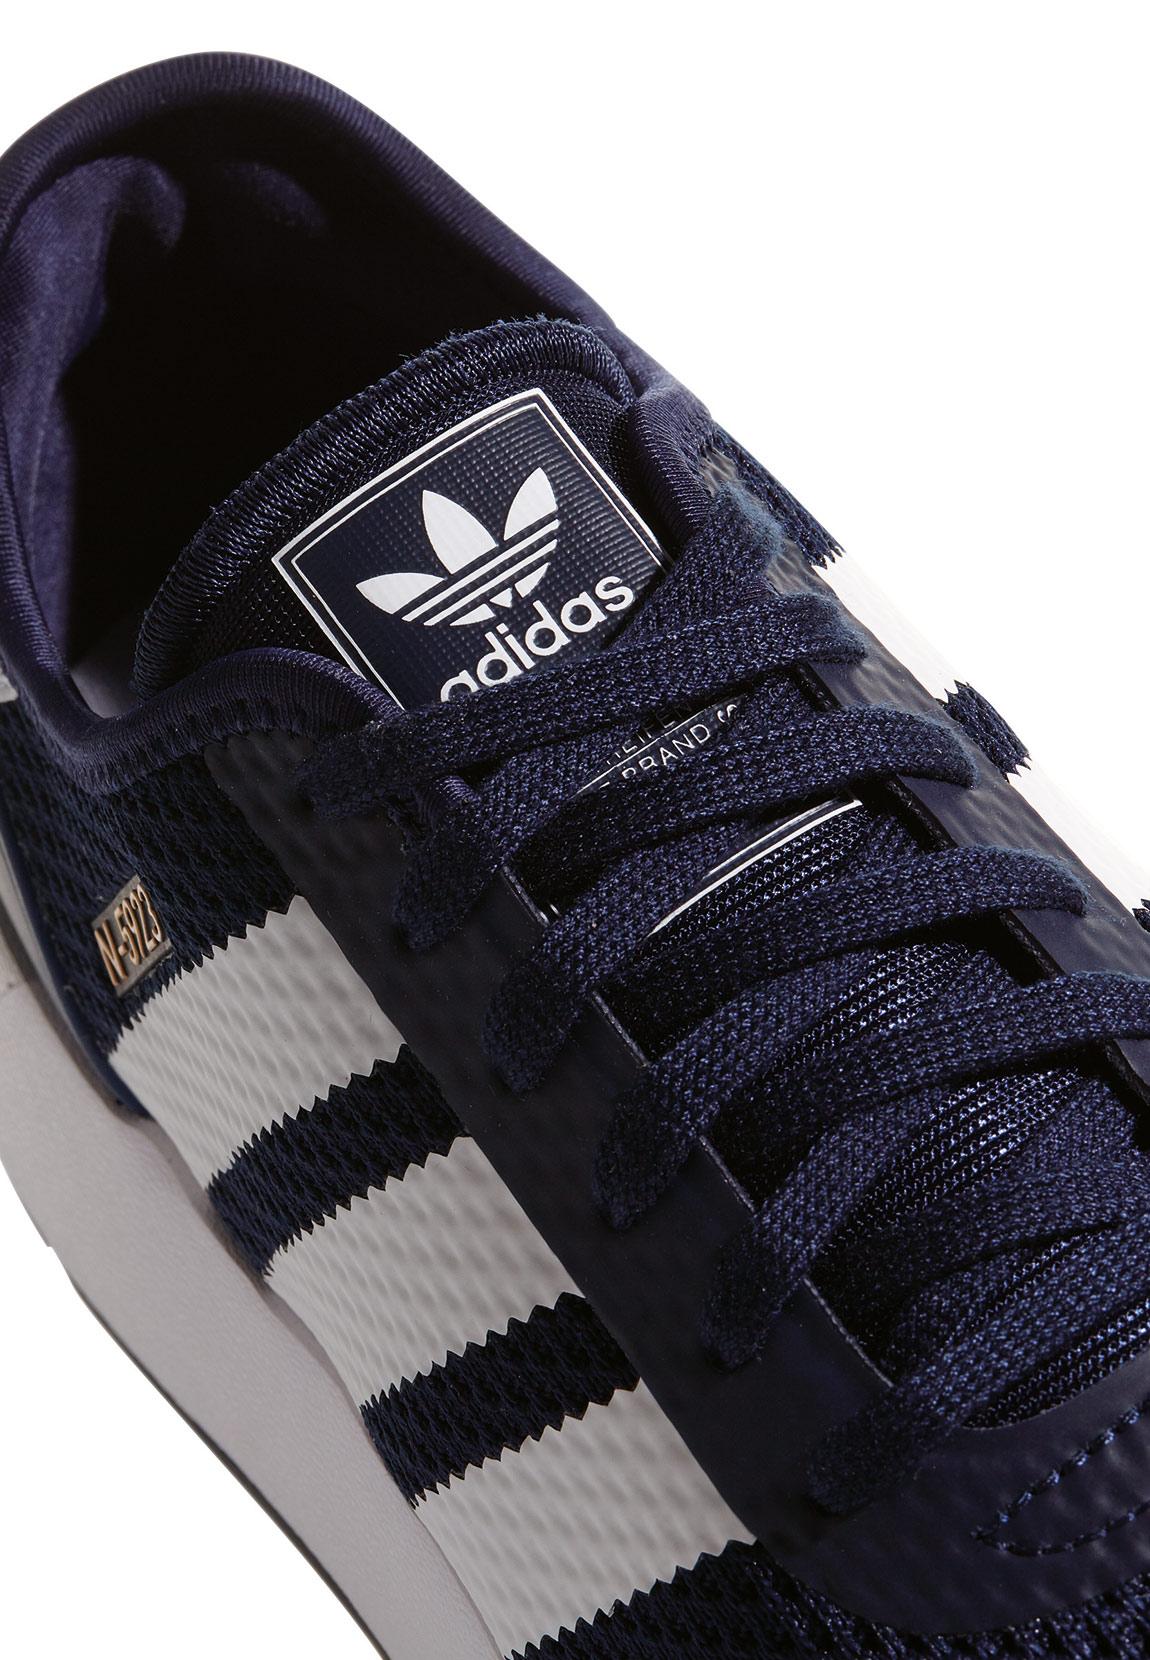 adidas sneaker iniki n 5923 db0961 blau schuhe herren. Black Bedroom Furniture Sets. Home Design Ideas